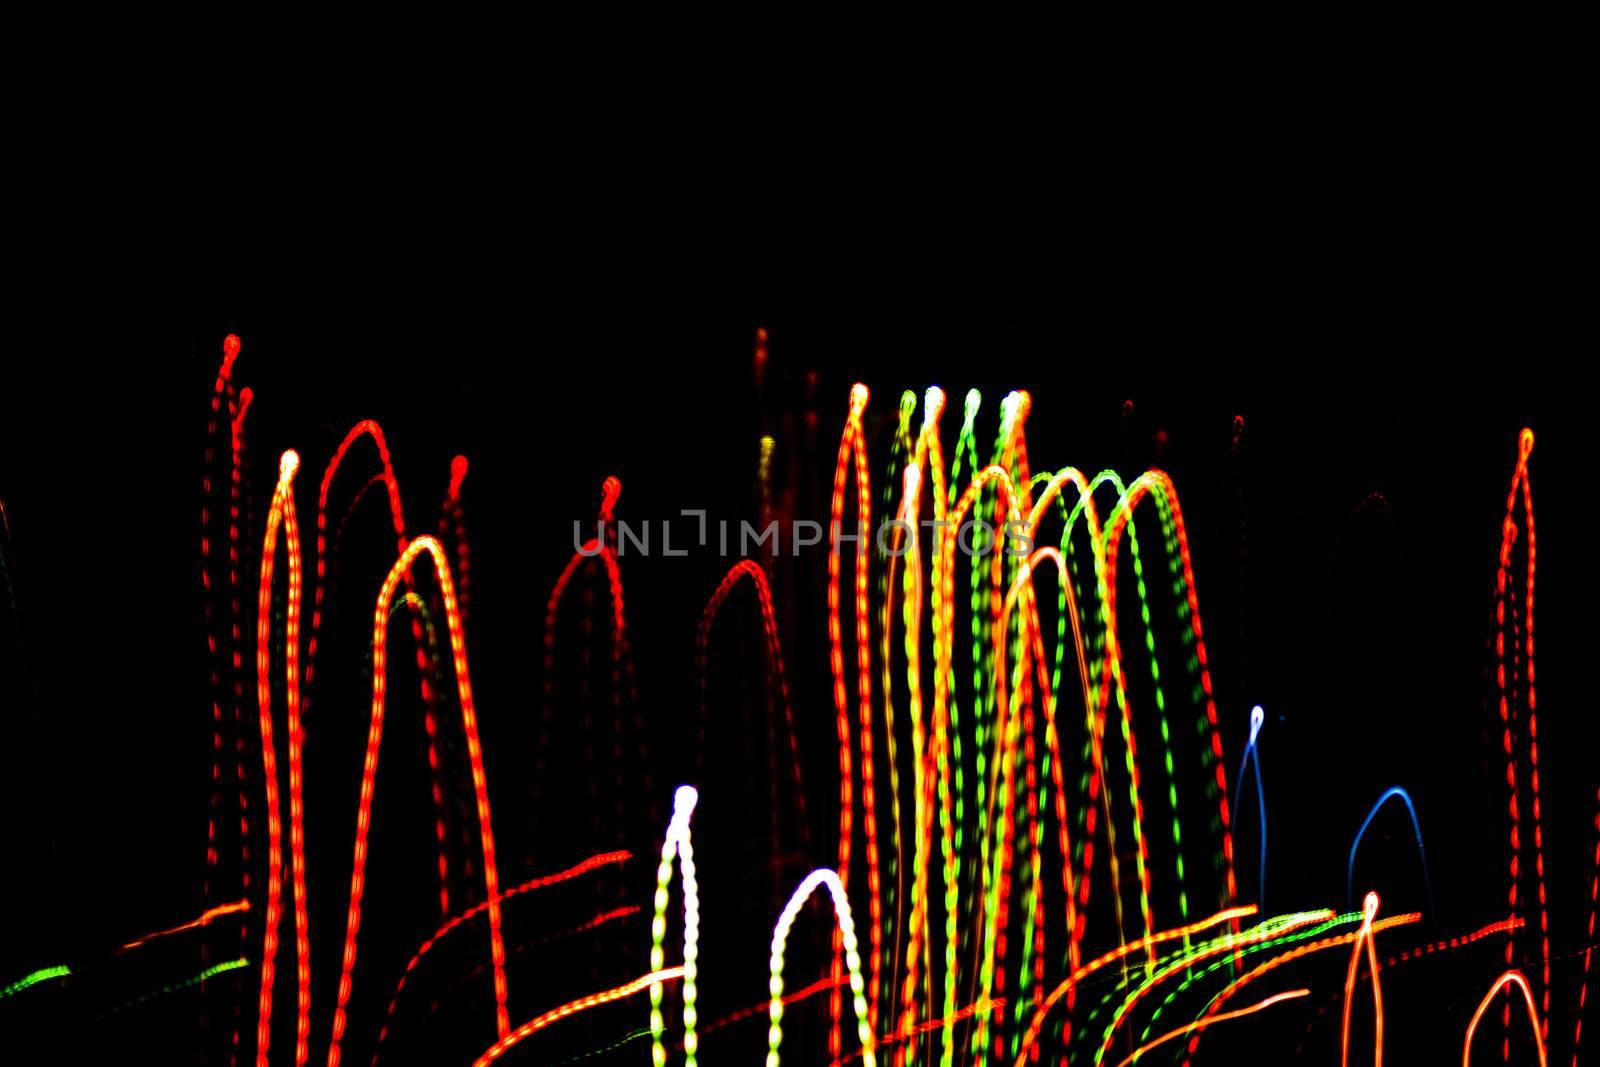 An image of abstract lights on black sky